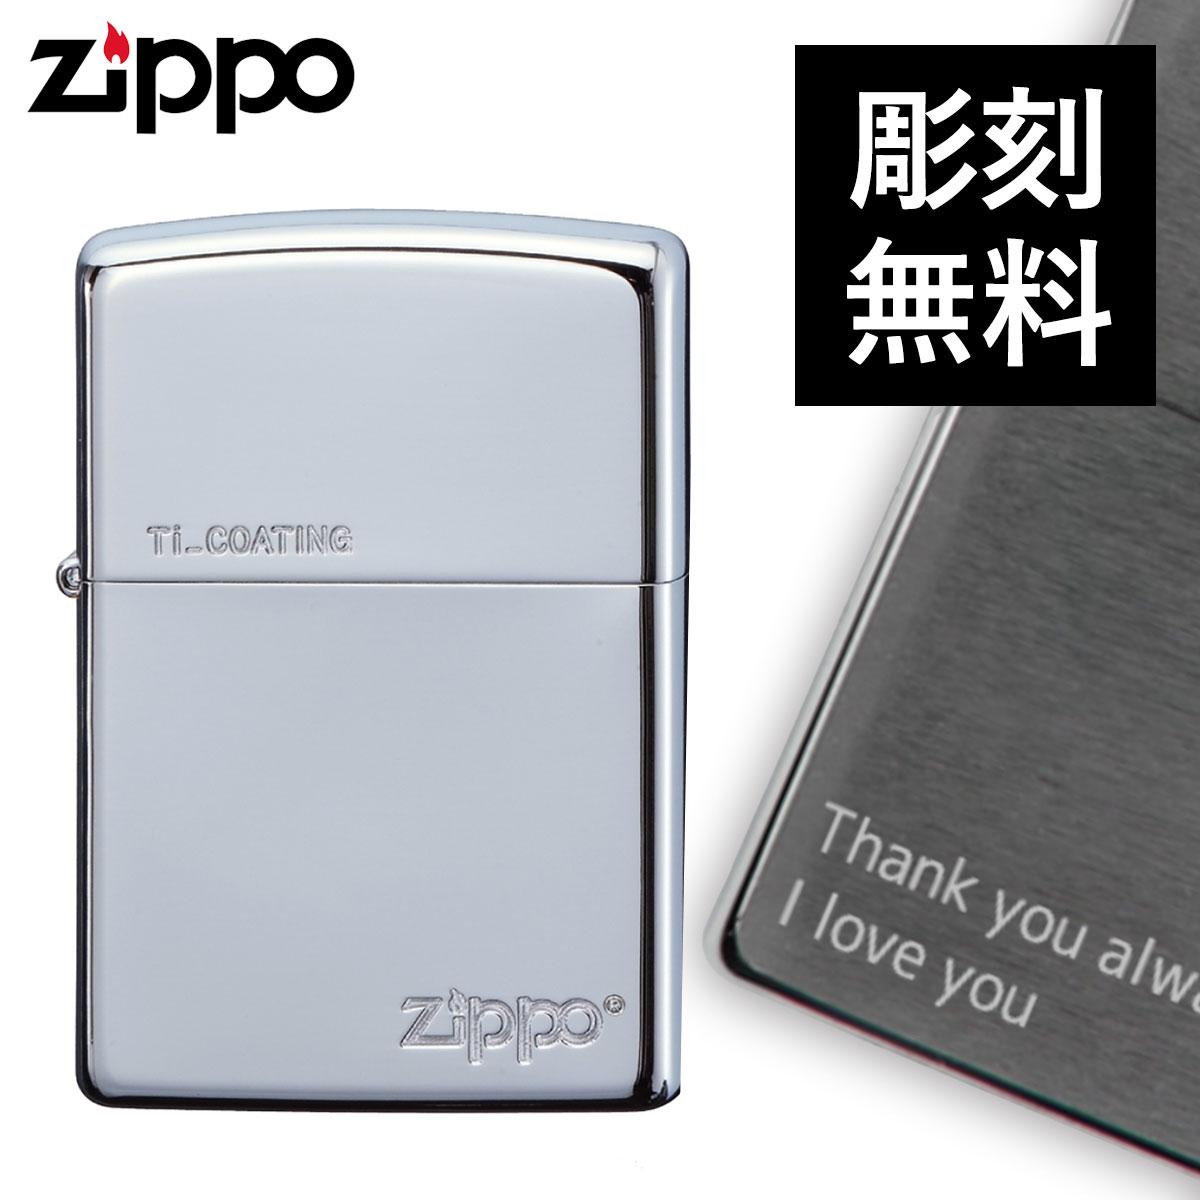 zippo 名入れ ジッポー ライター チタン キズがつきにくい 銀チタン A オイルライター ジッポライター ギフト プレゼント 彼氏 男性 メンズ